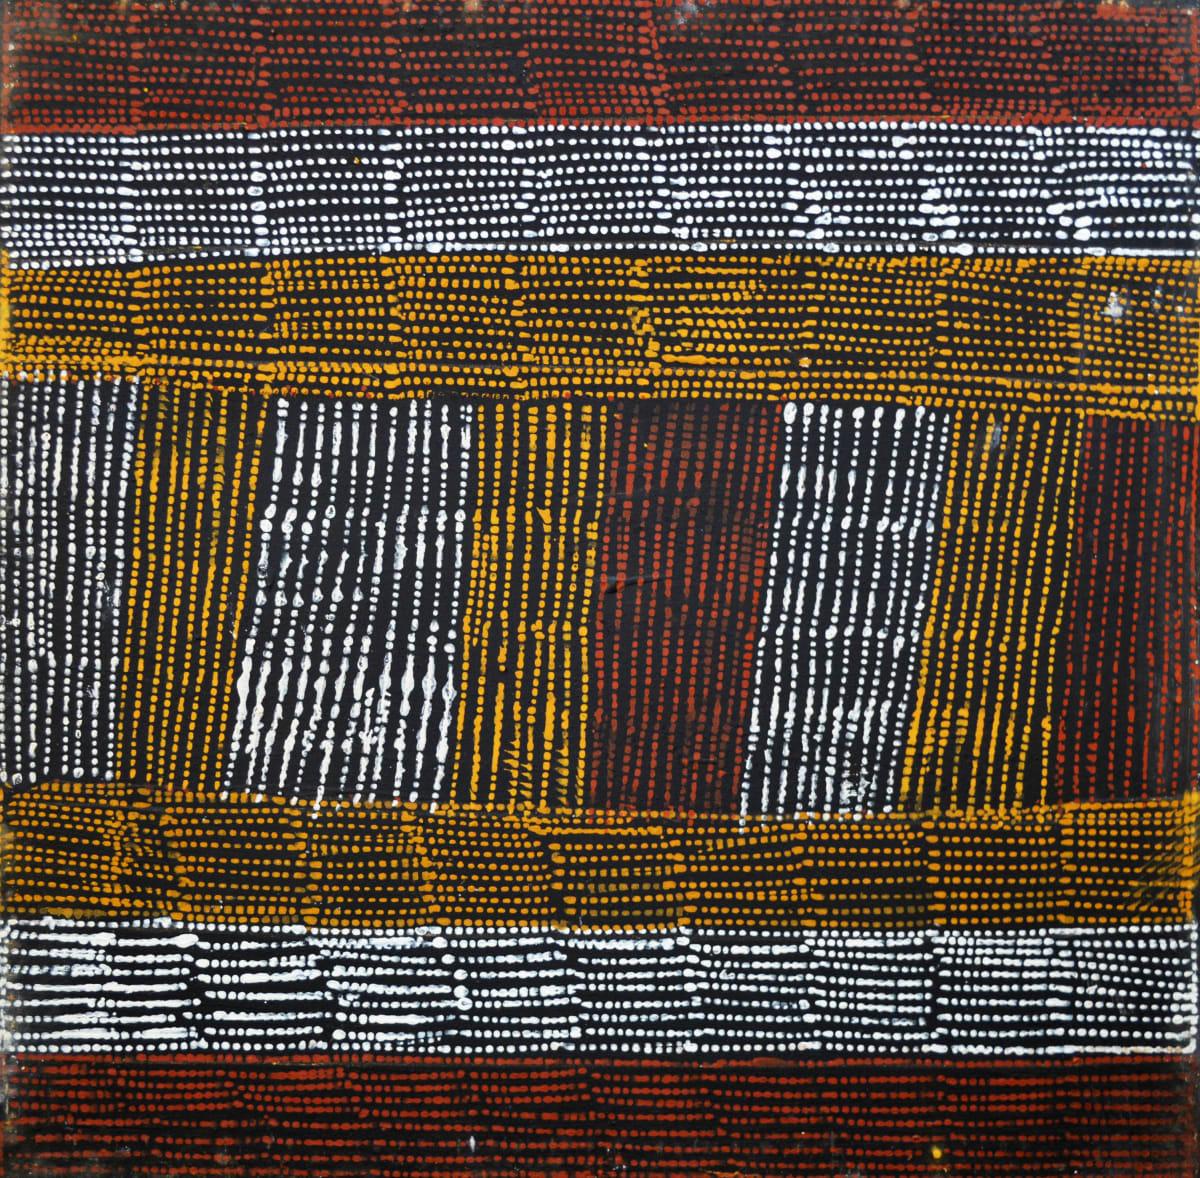 Dymphna Kerinauia Jilamara natural ochres on canvas 60 x 60 cm